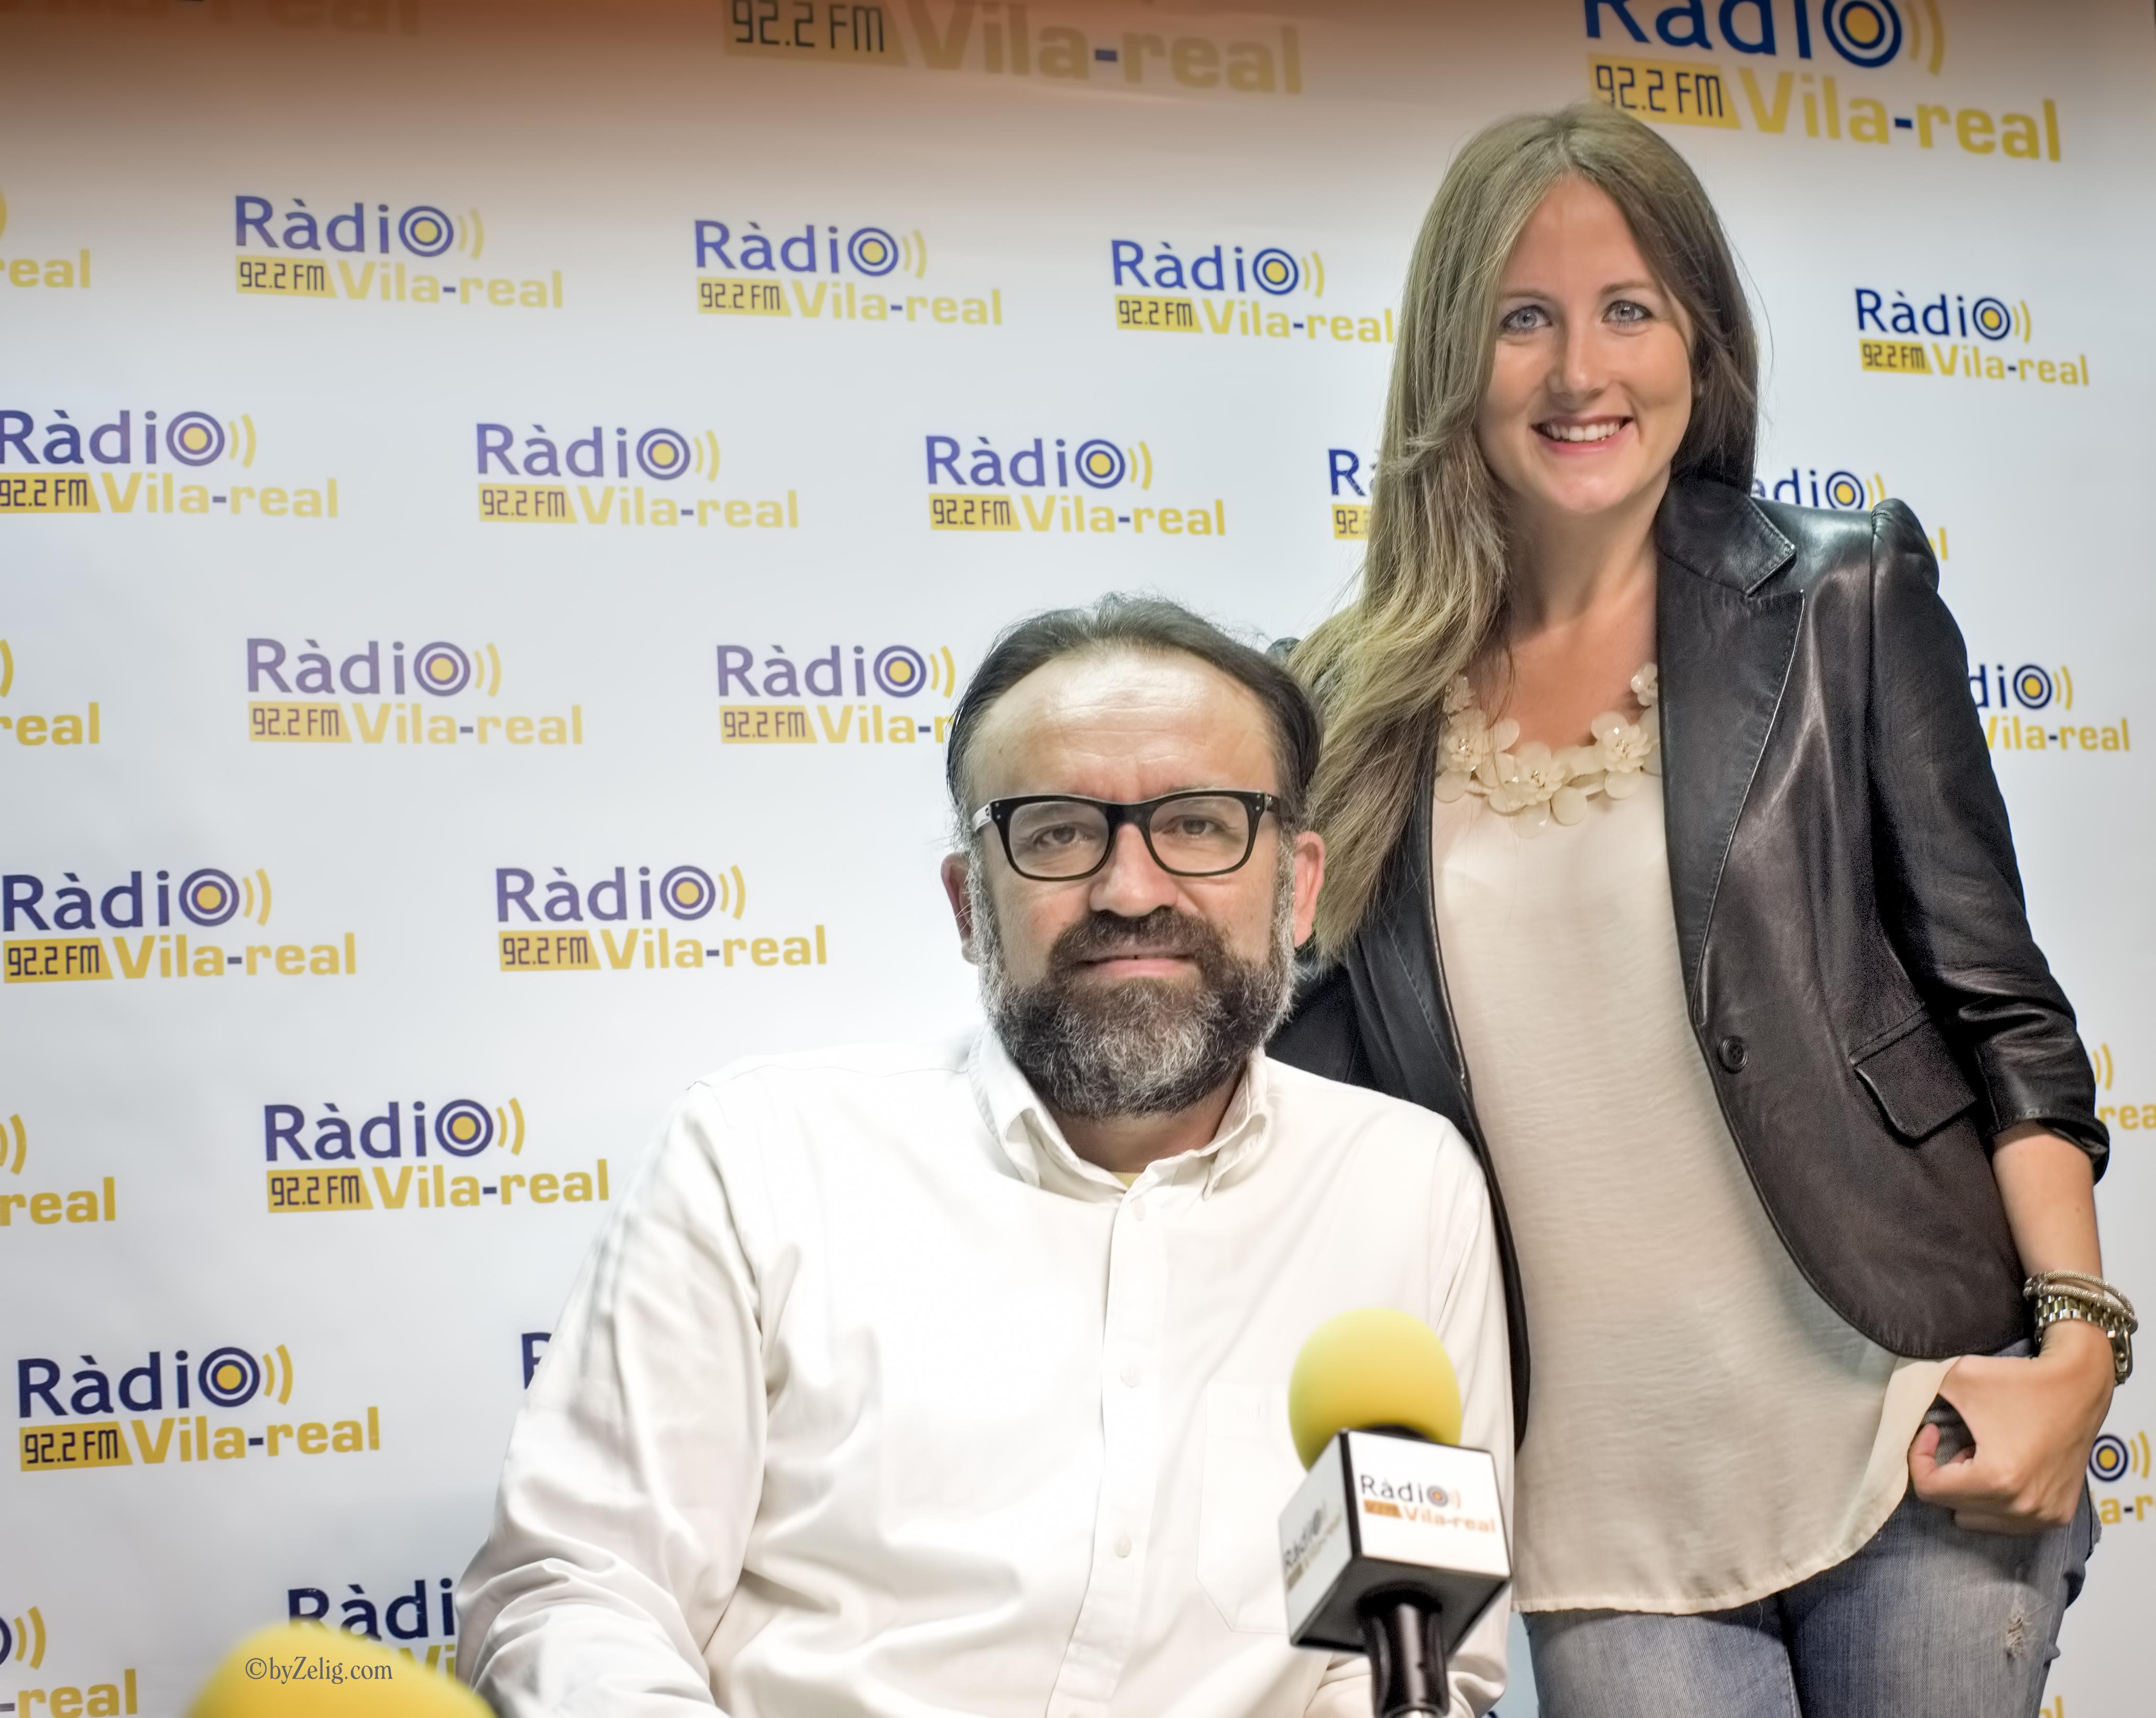 Esports Radio Vila-real. Programa del 6 de febrero 2018